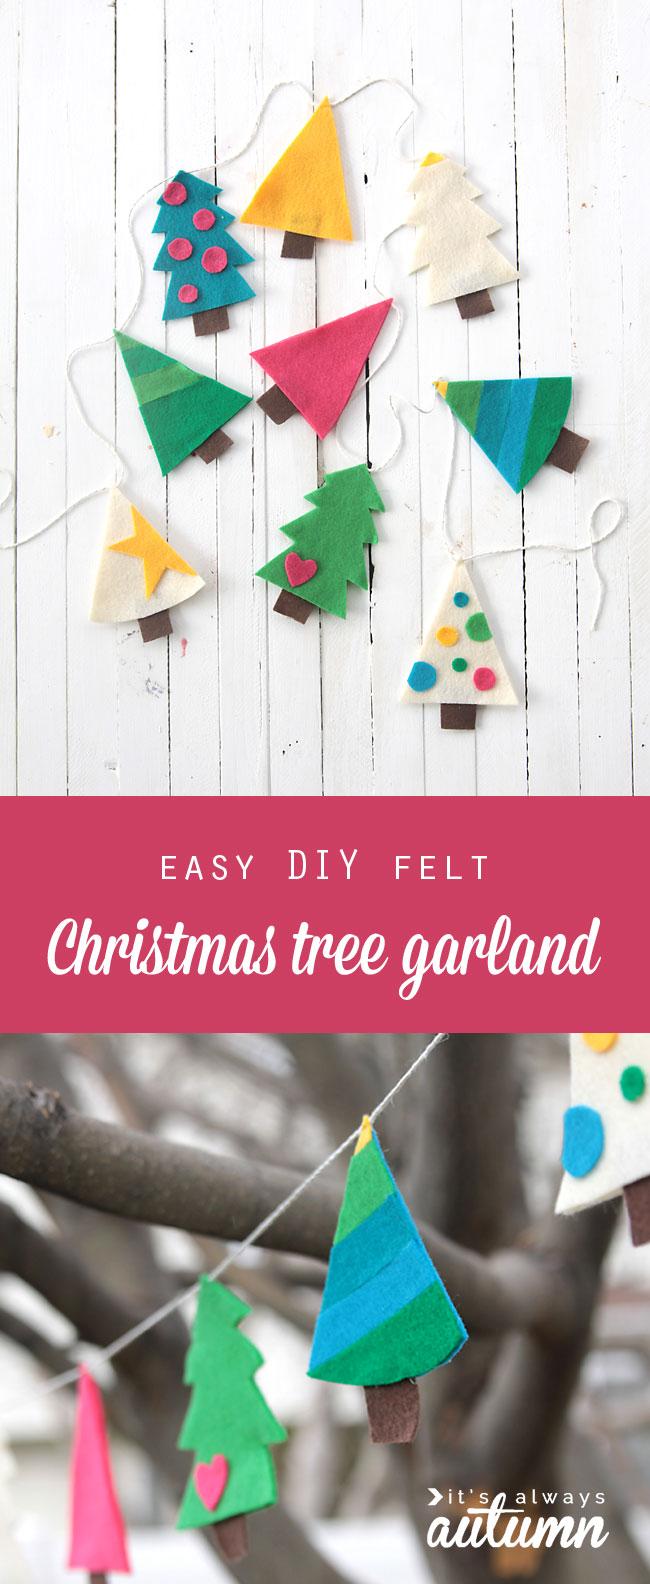 easy DIY felt Christmas tree garland - simple holiday decor